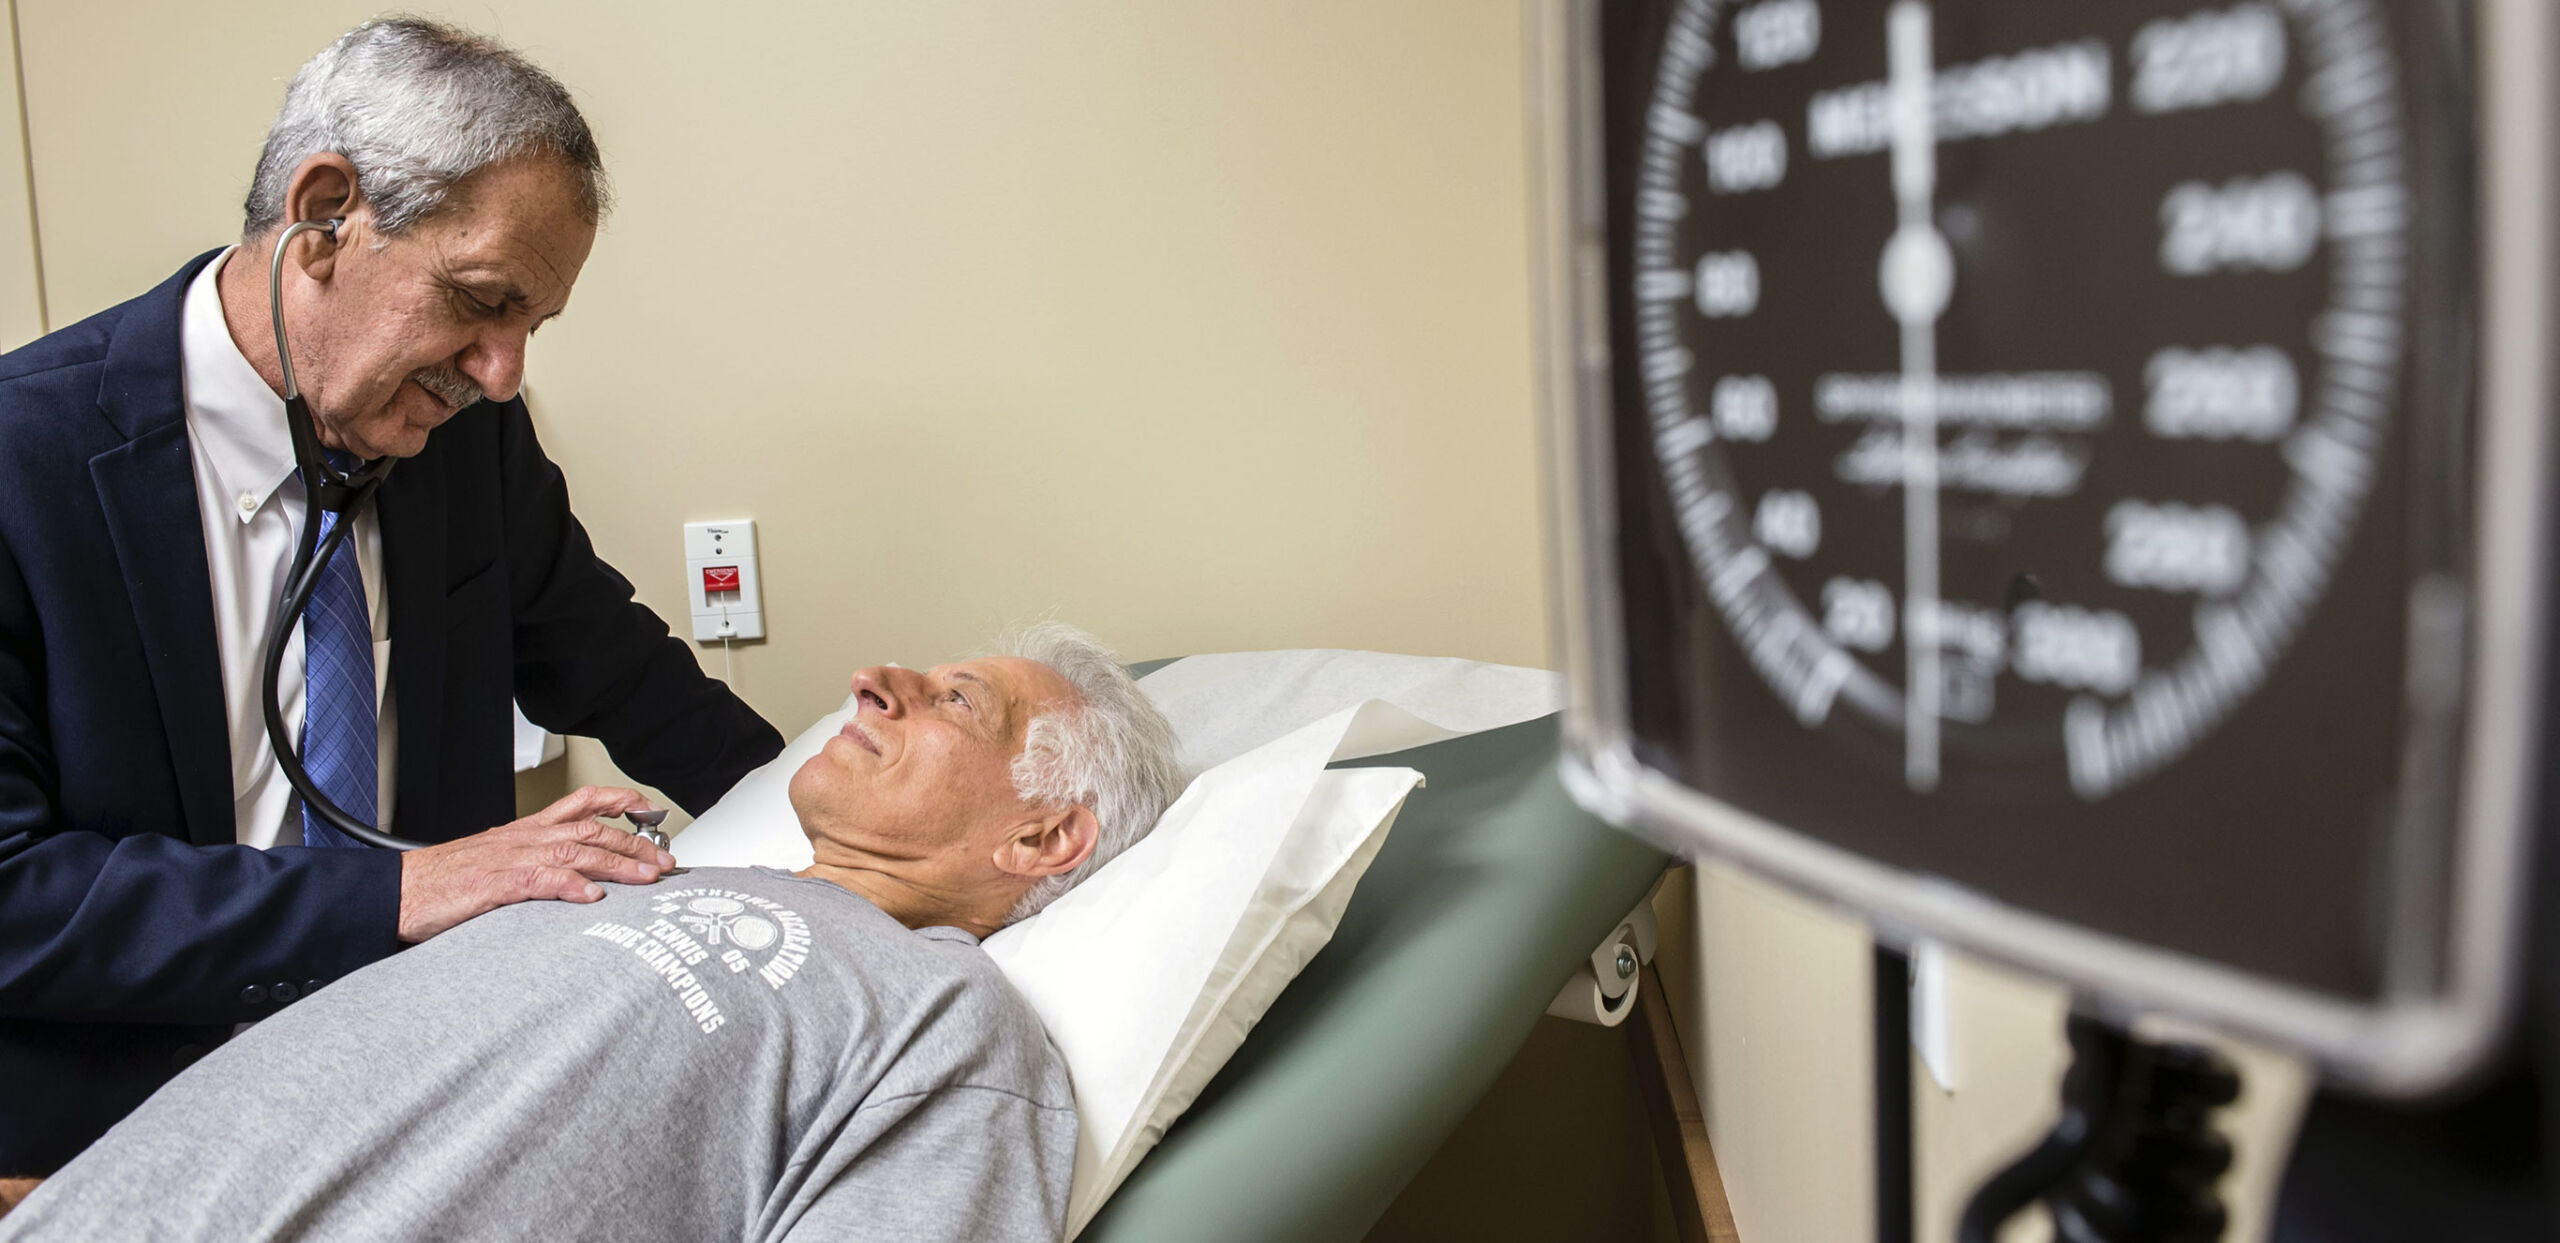 Cardiologist Mark Porway, MD, examines a patient, Hampshire Cardiovascular Associates, Northampton, MA 01060